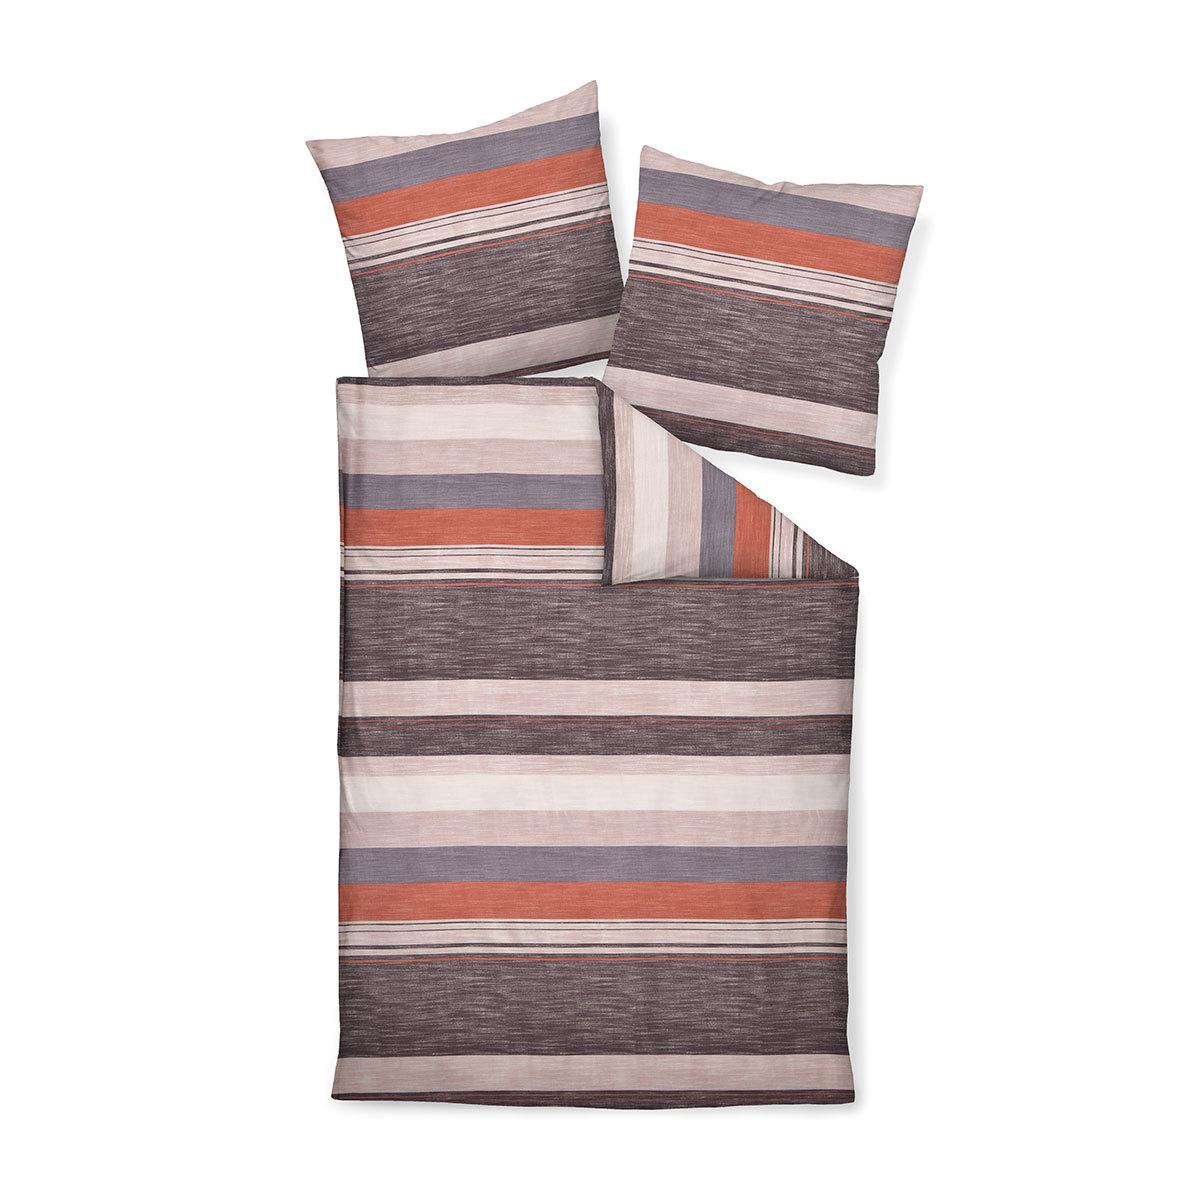 janine mako satin bettw sche moments 98019 07 g nstig. Black Bedroom Furniture Sets. Home Design Ideas